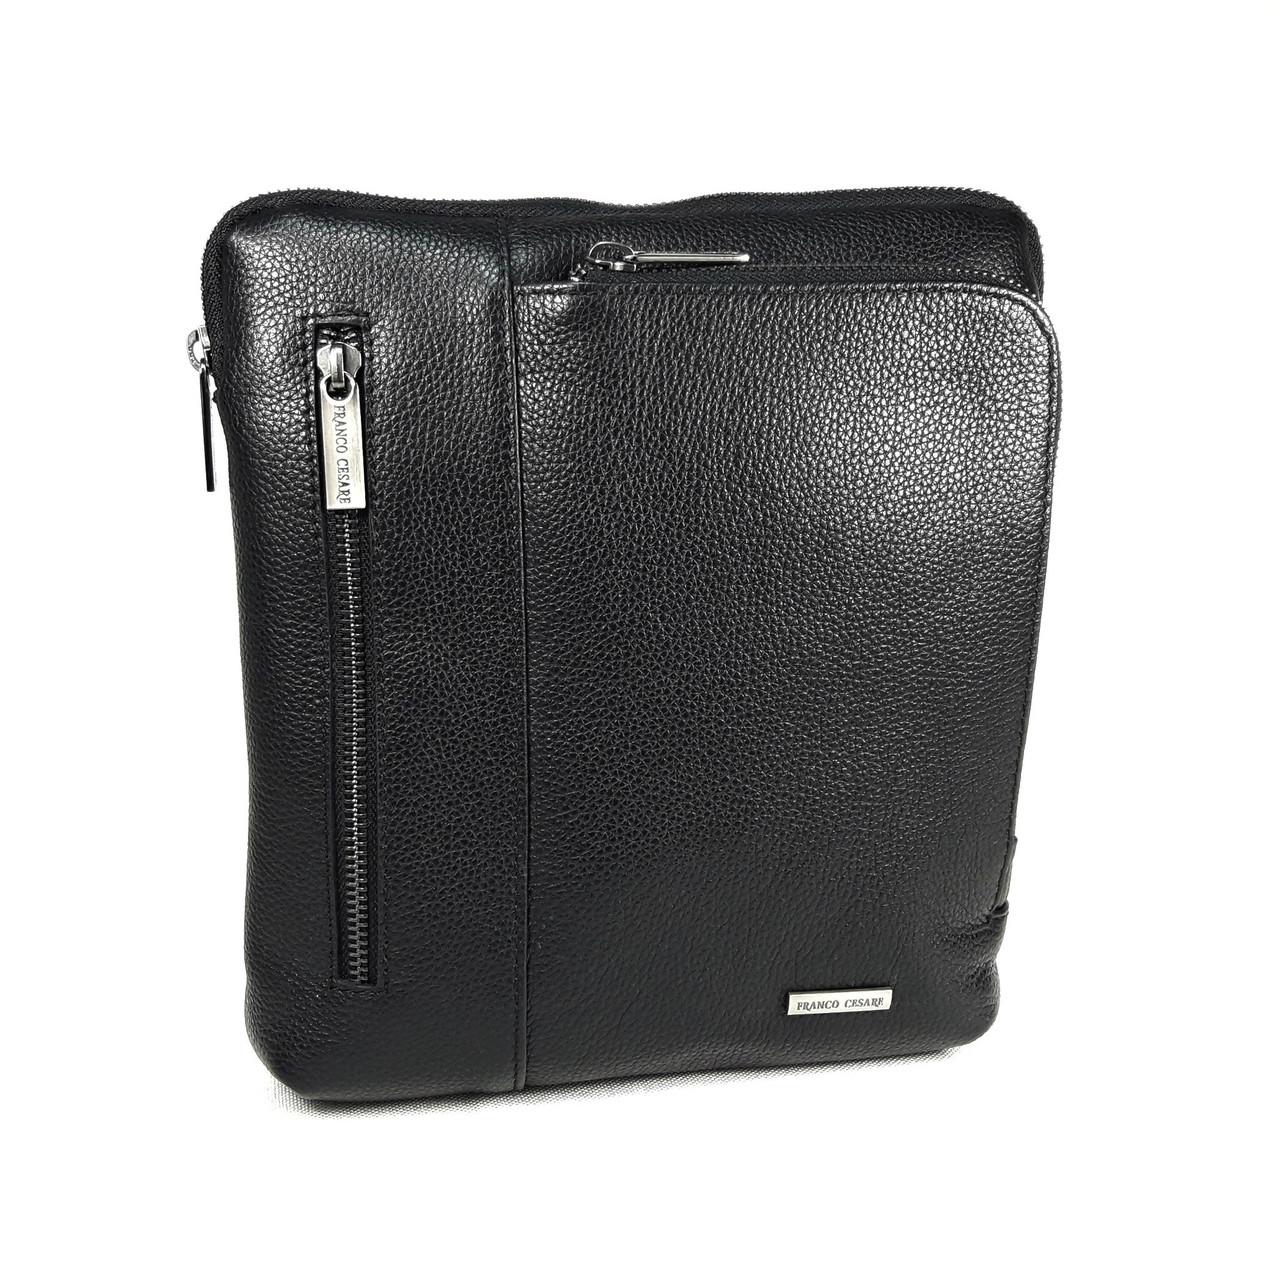 Кожаная наплечная сумка FC-0342-V1 бренда FRANCO CESARE